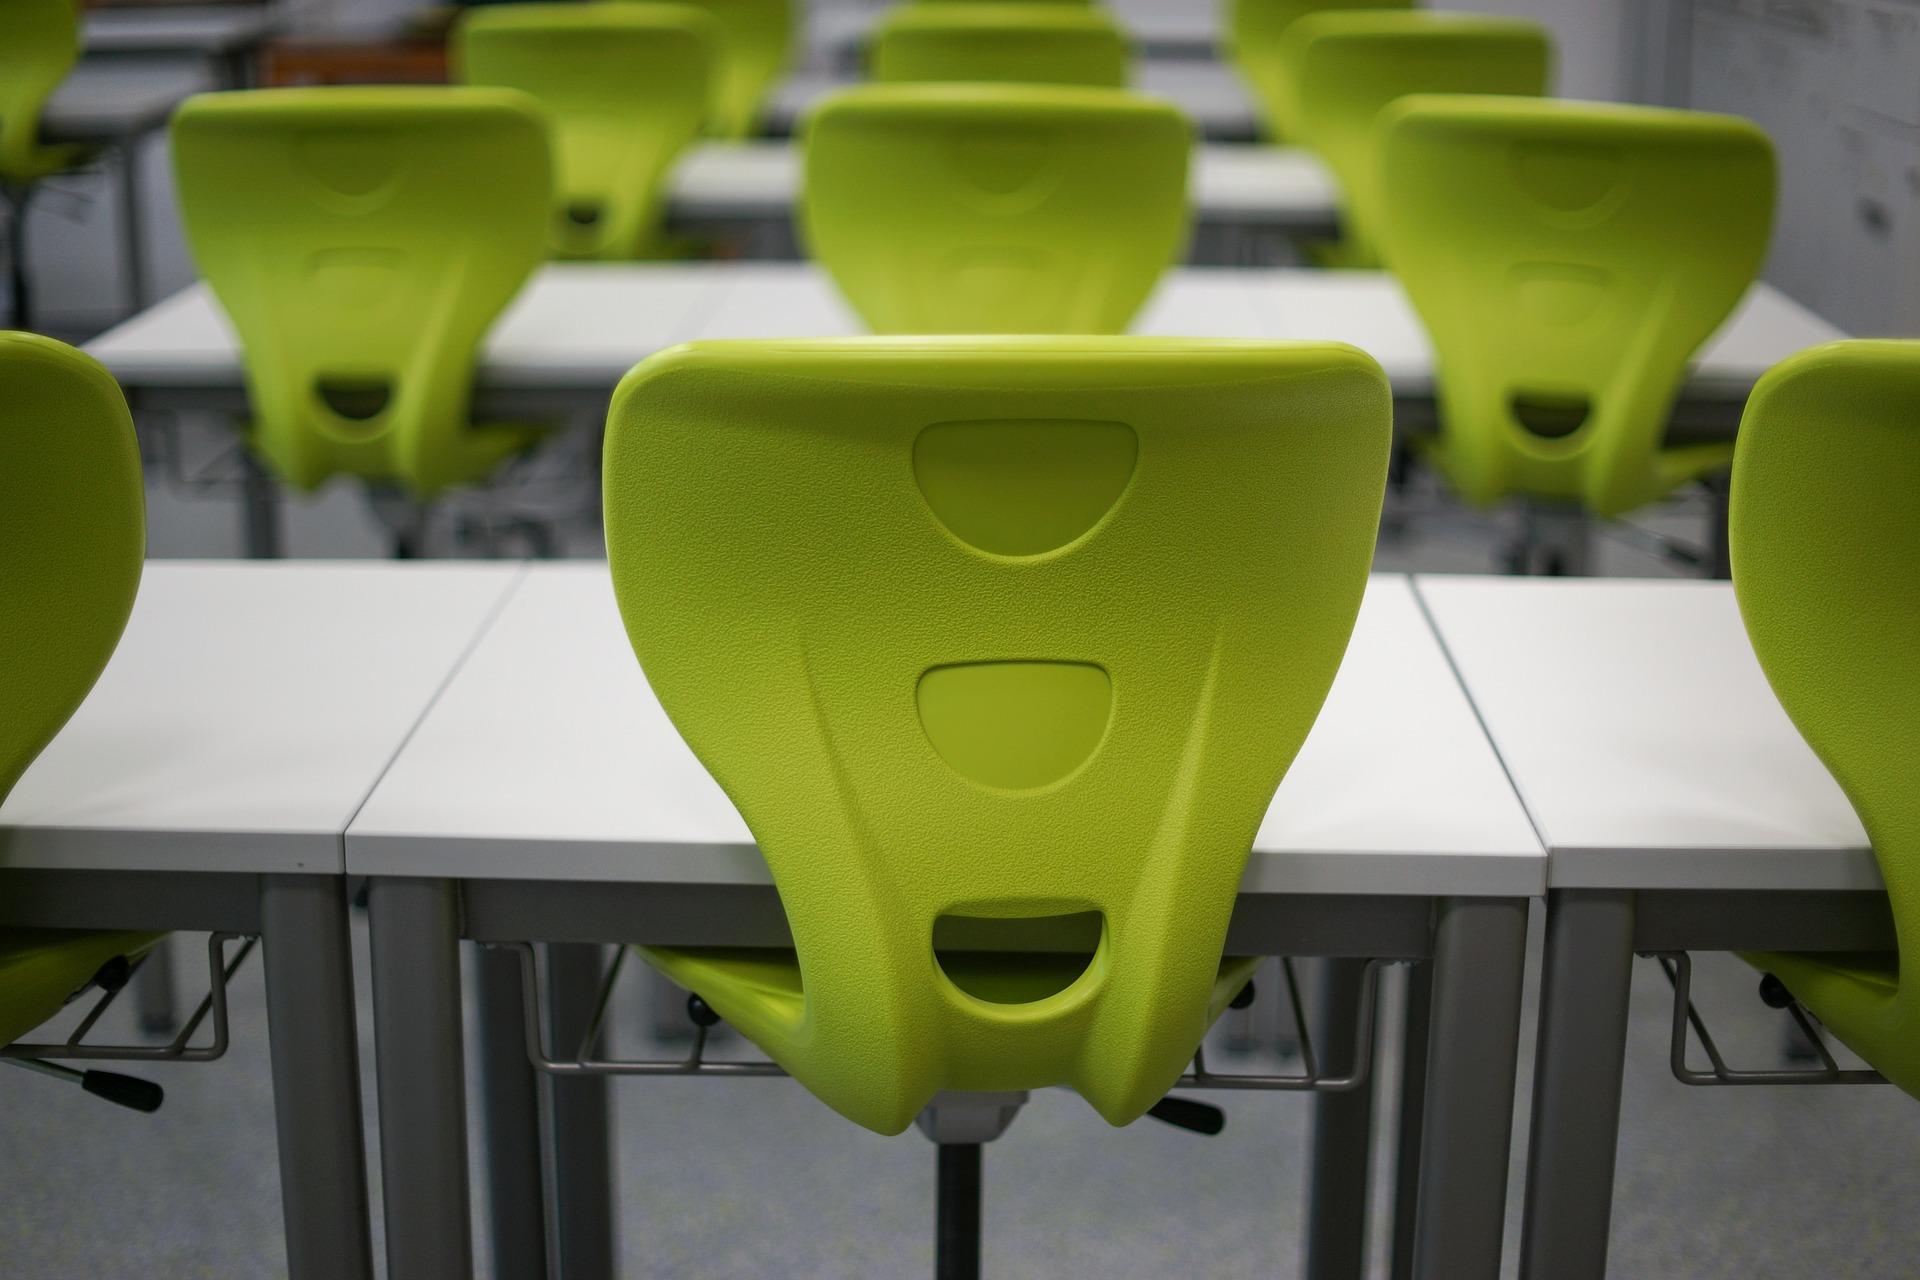 edwards & hill school furniture